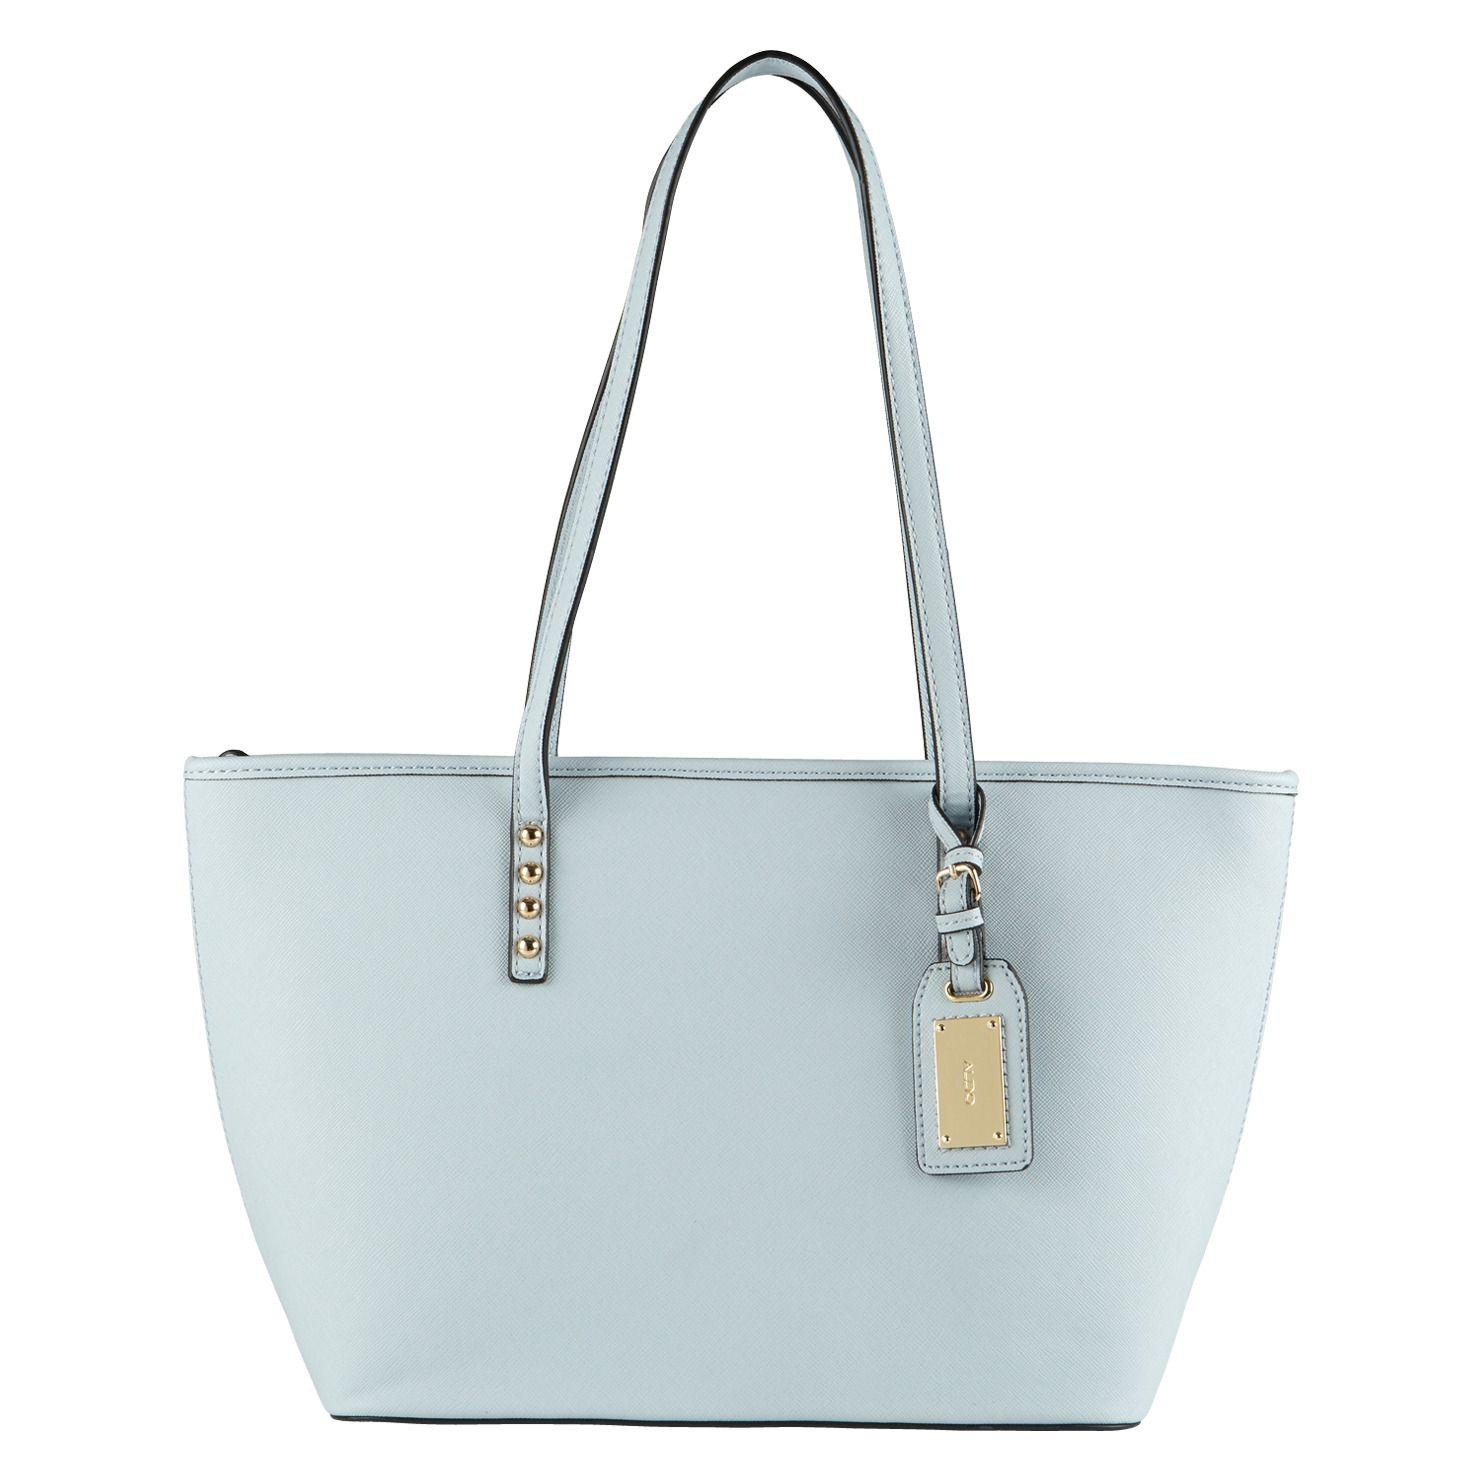 aldo shoes handbags shoulder bags totes